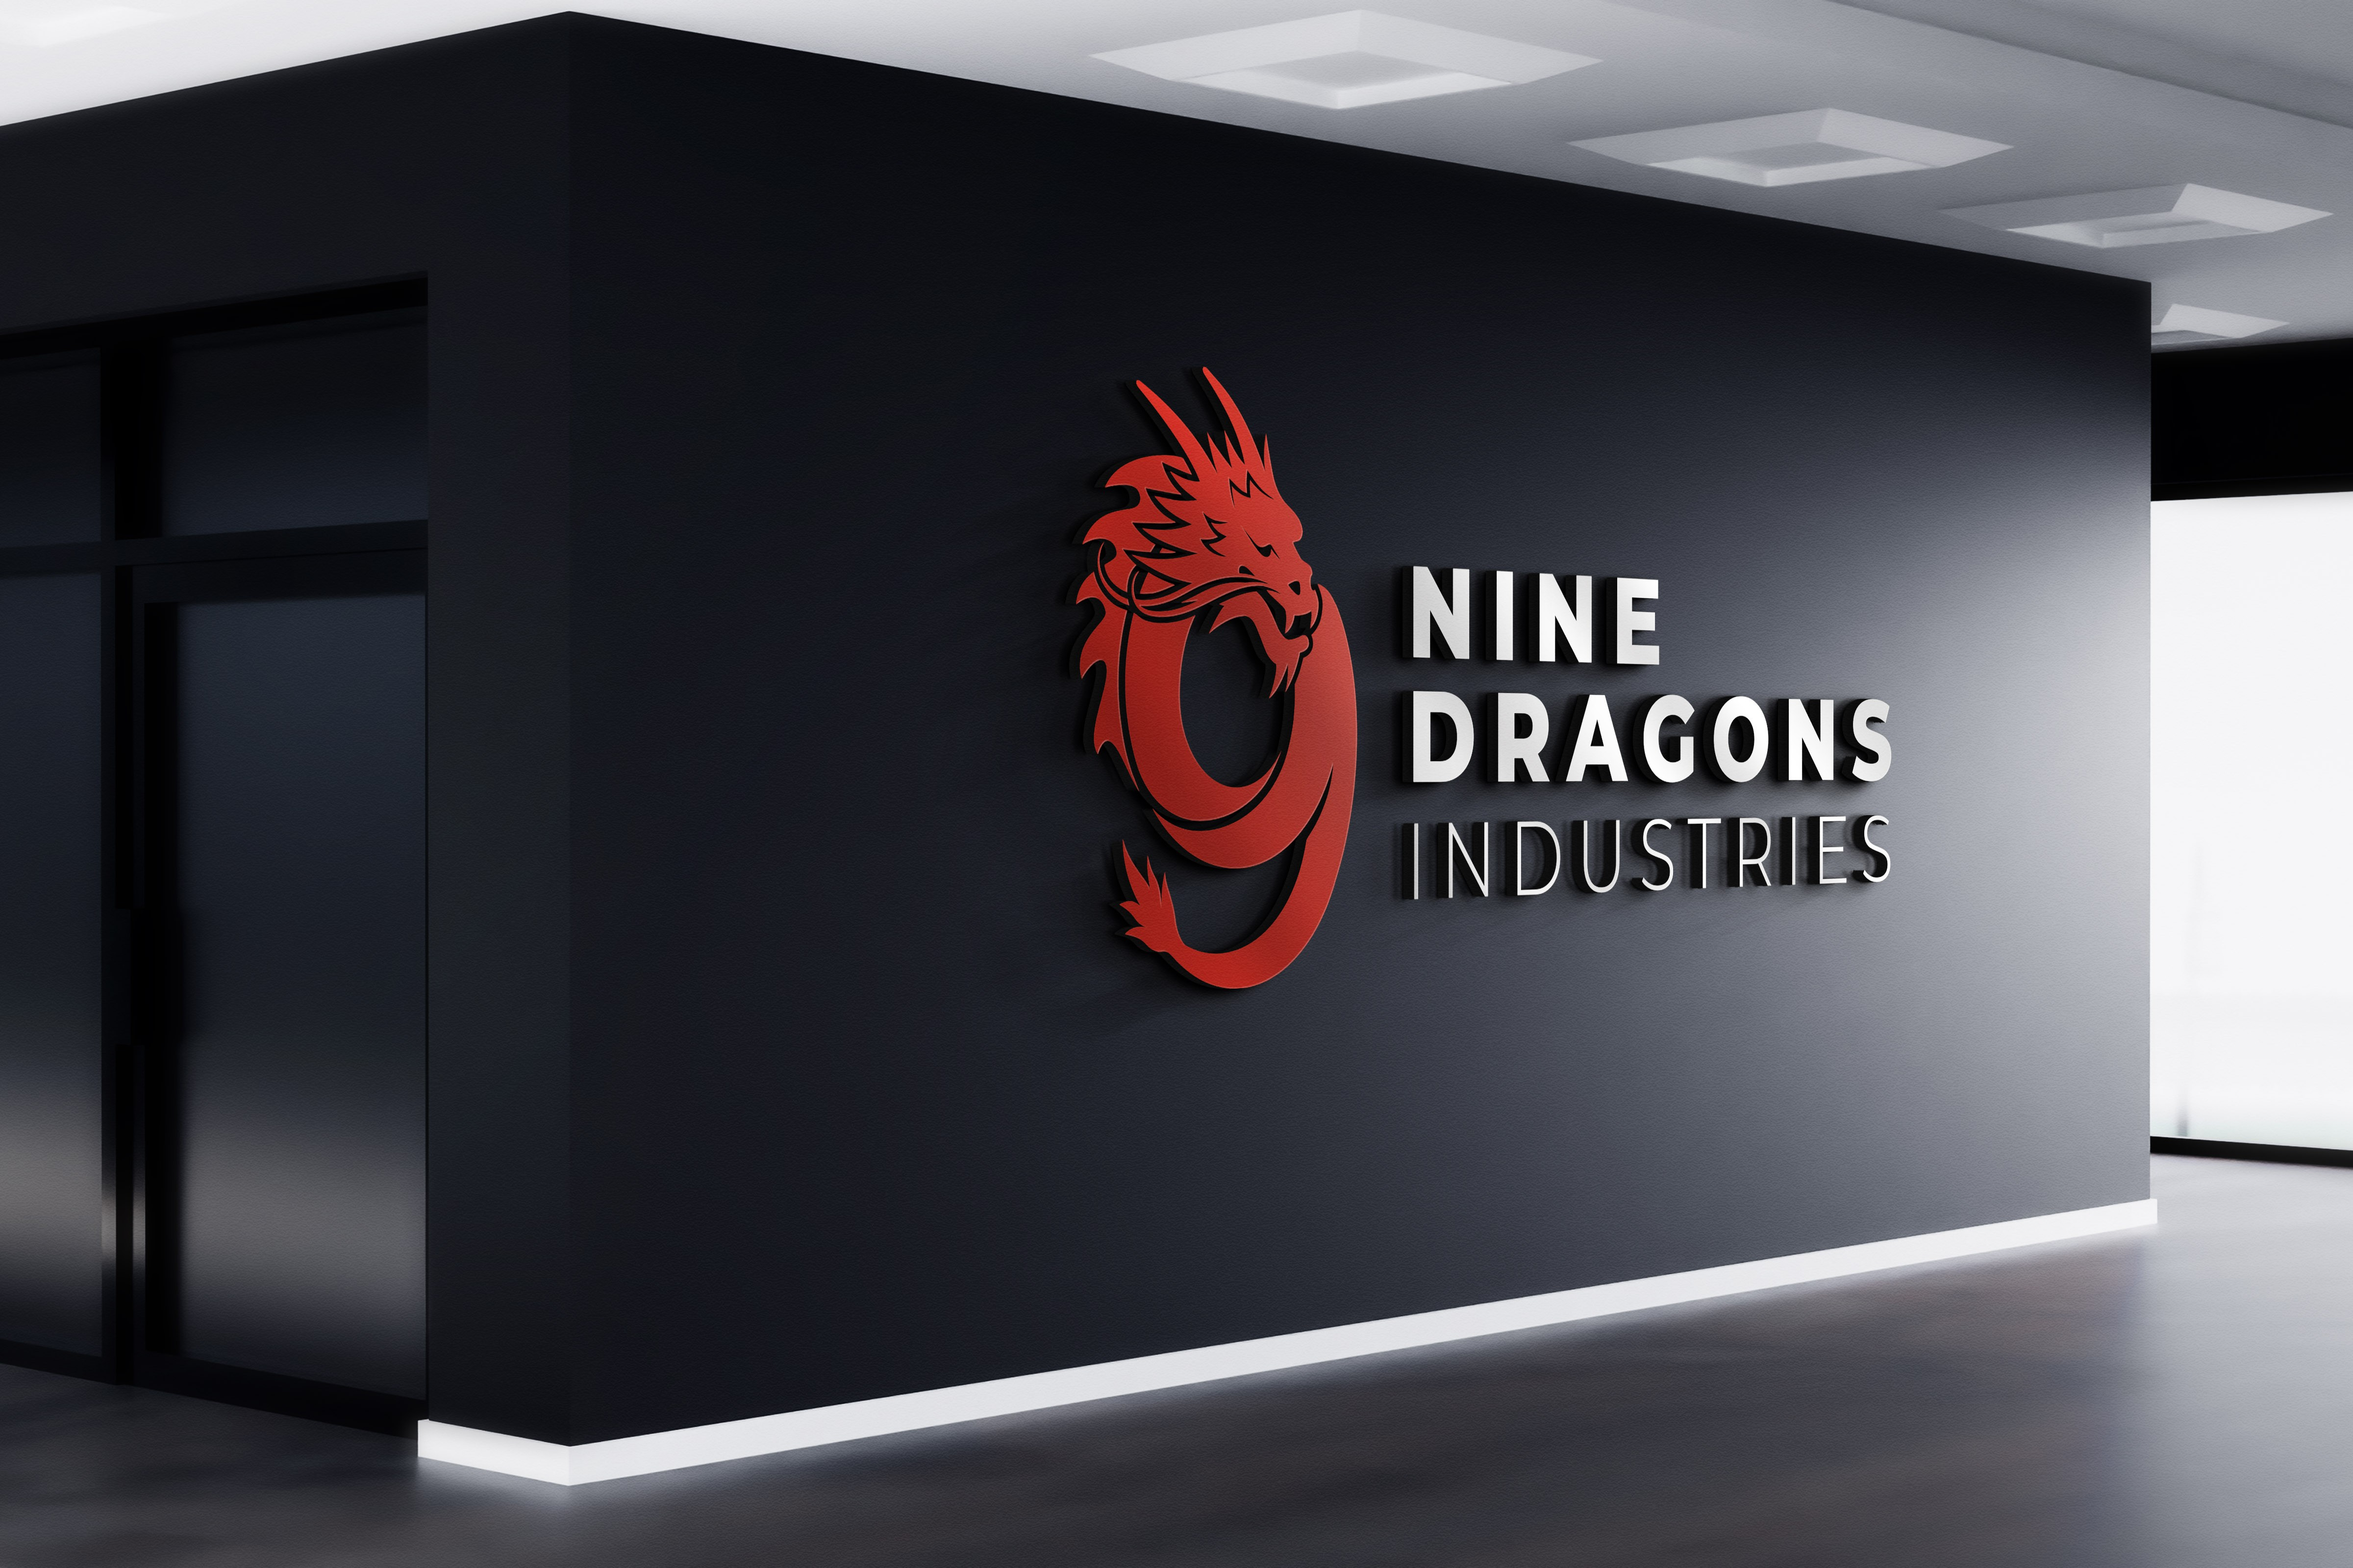 Design for Nine Dragons Industries